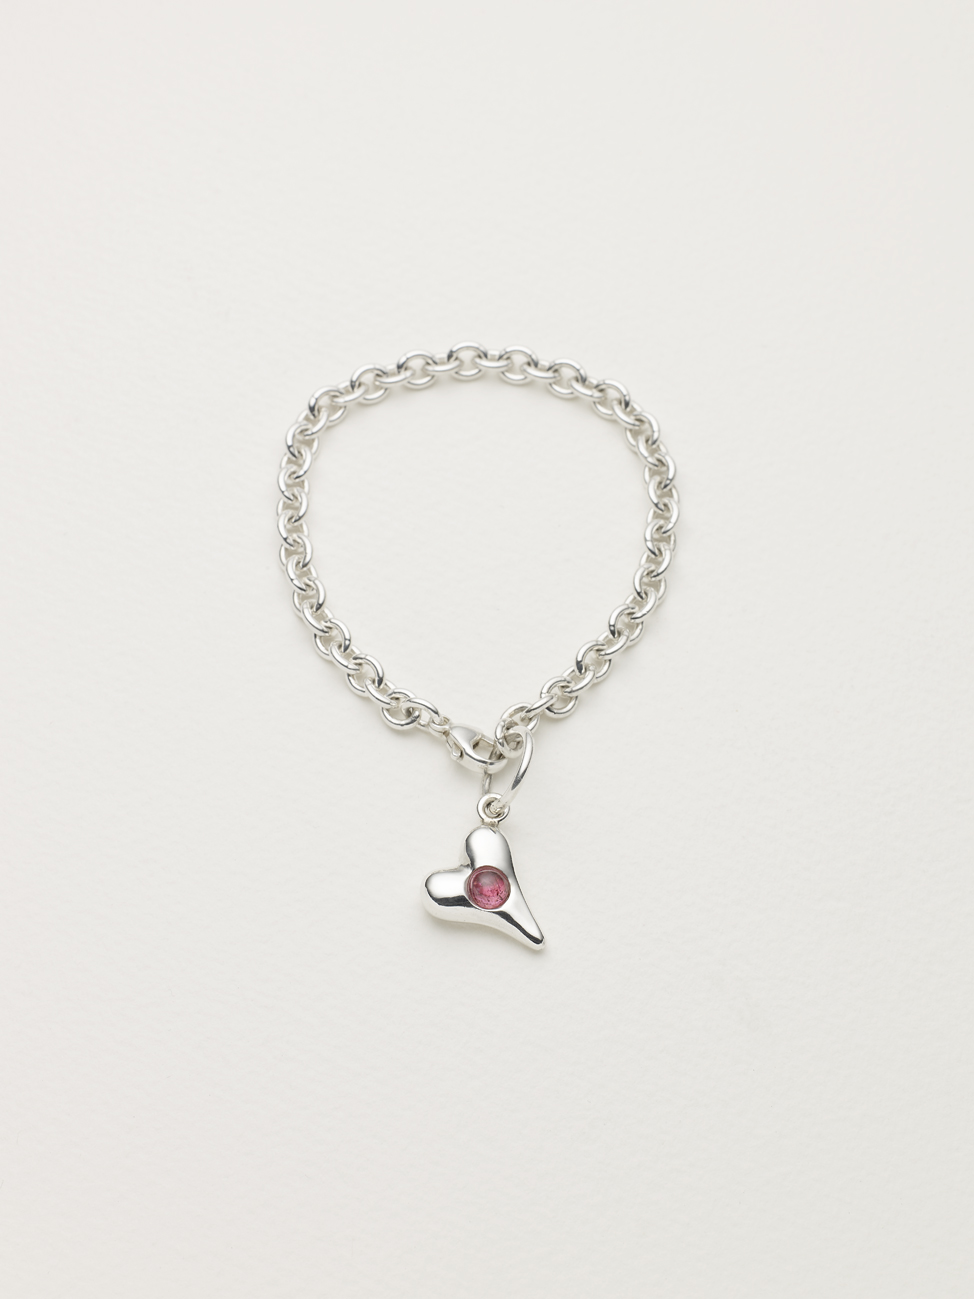 Sterling Silver Heart Bracelet, set cabochon pink tourmaline